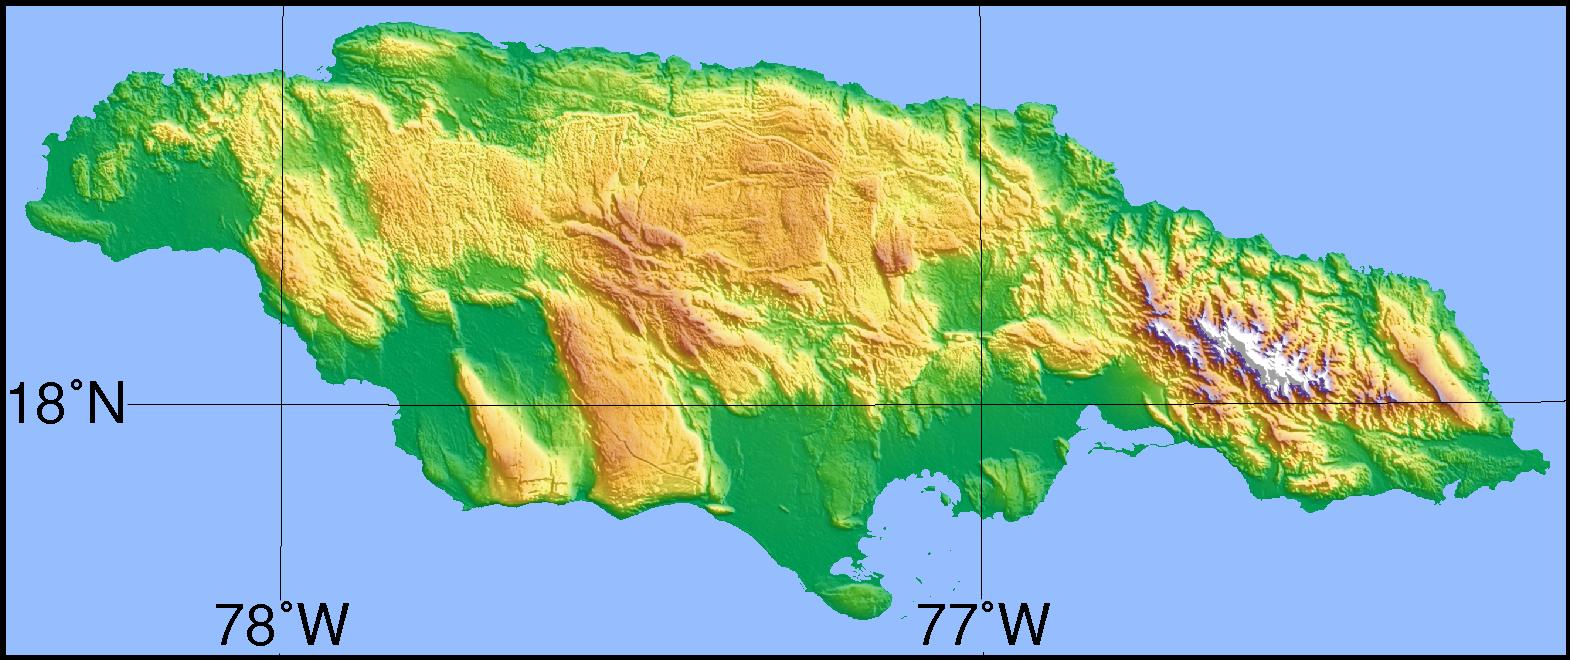 Topografisk Karta Over Jamaica Karta Av Topografiska Jamaica